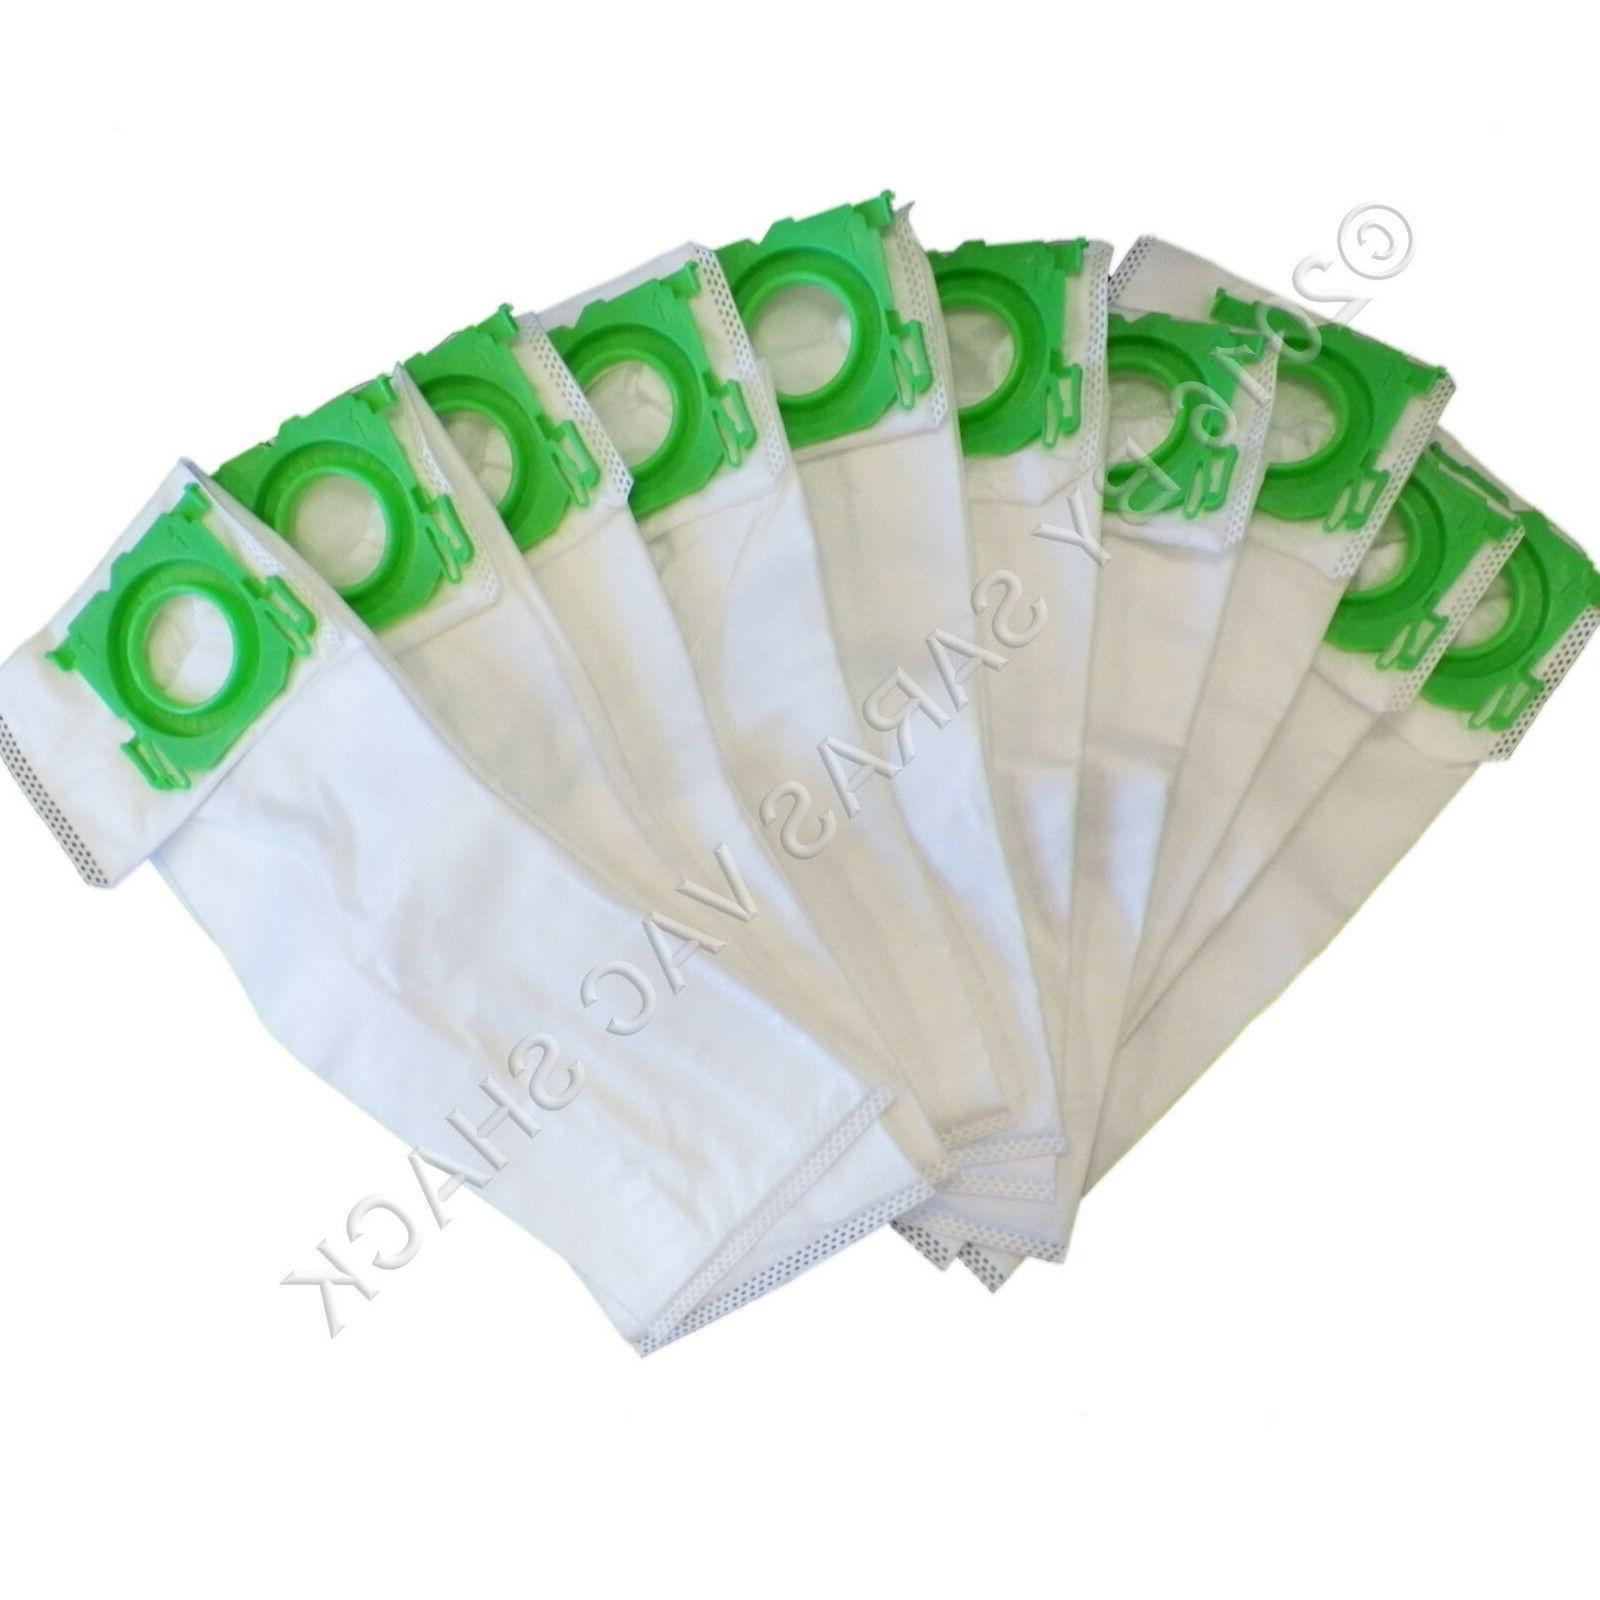 10 Synthetic Cloth Vacuum Bags for SEBO Windsor Sensor Comme